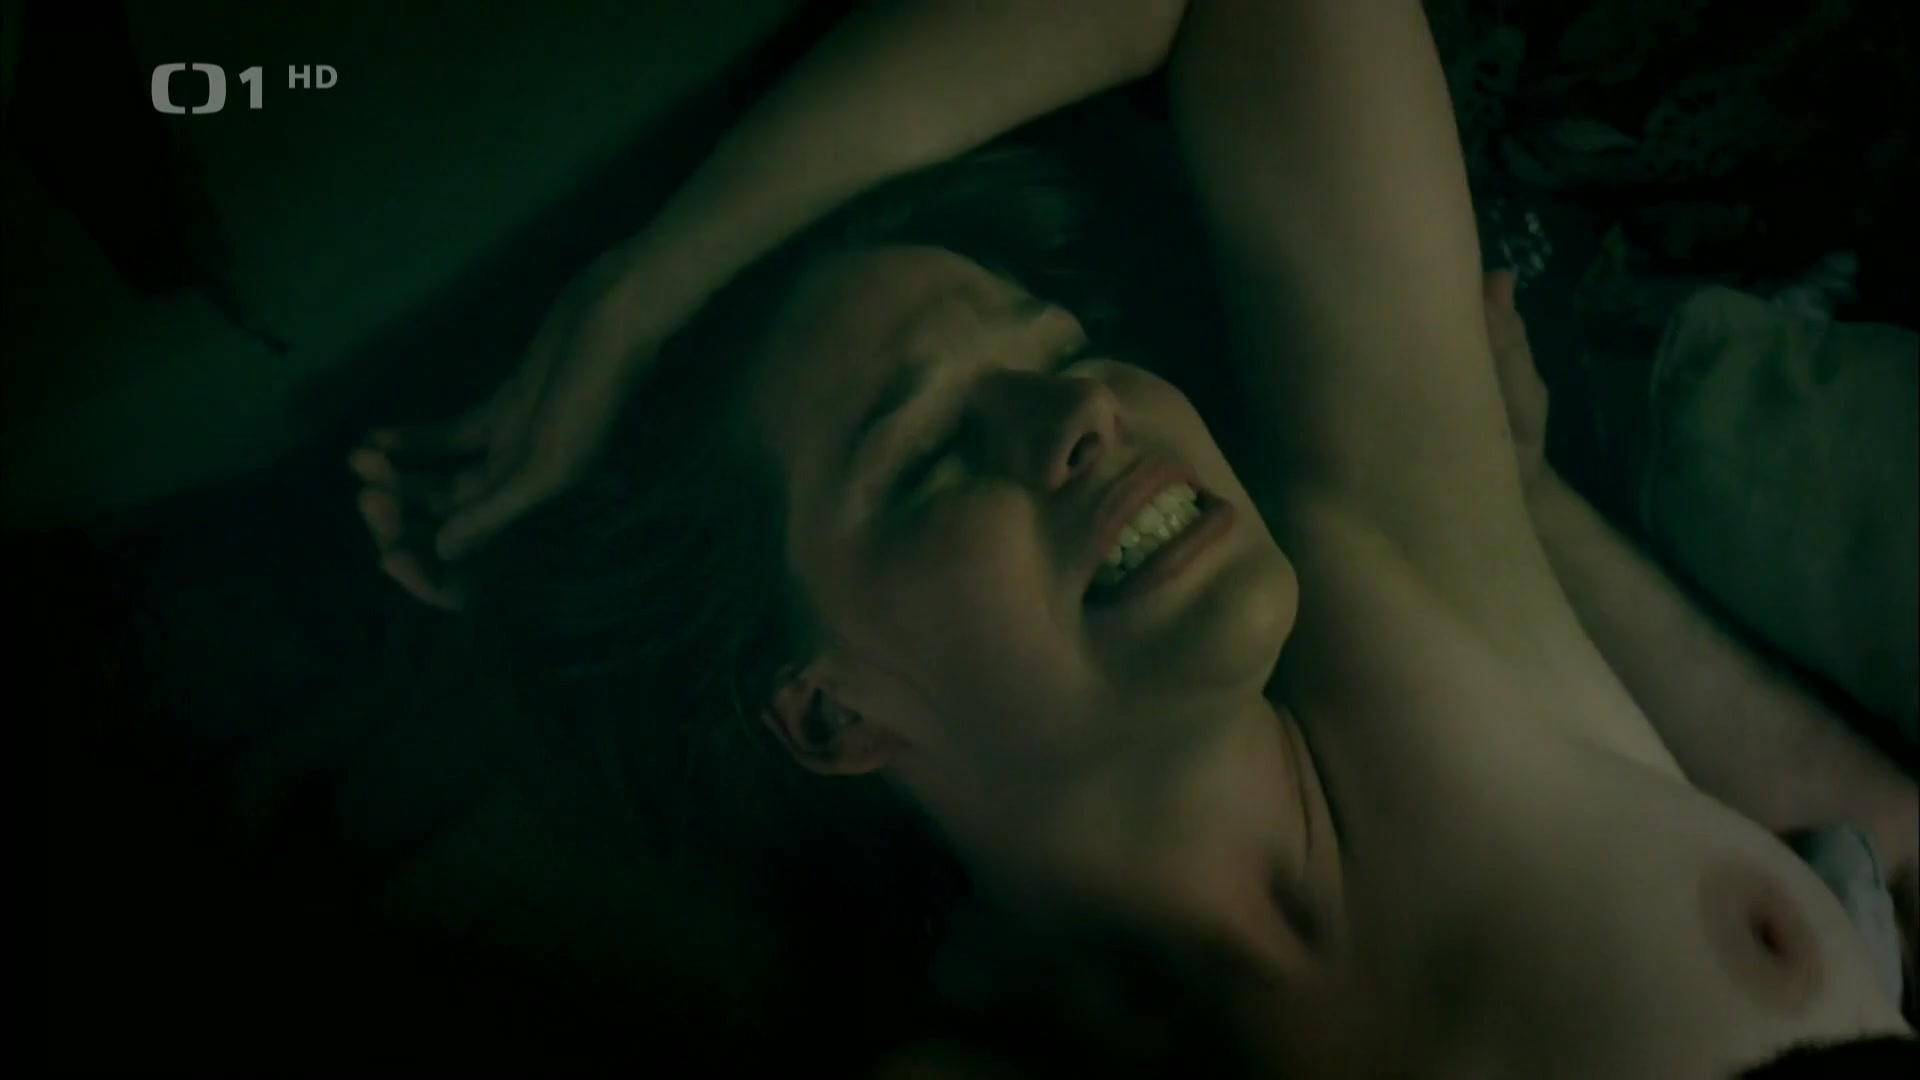 Natalie Rehorova nude - Skoda lasky s01e15 (2013)